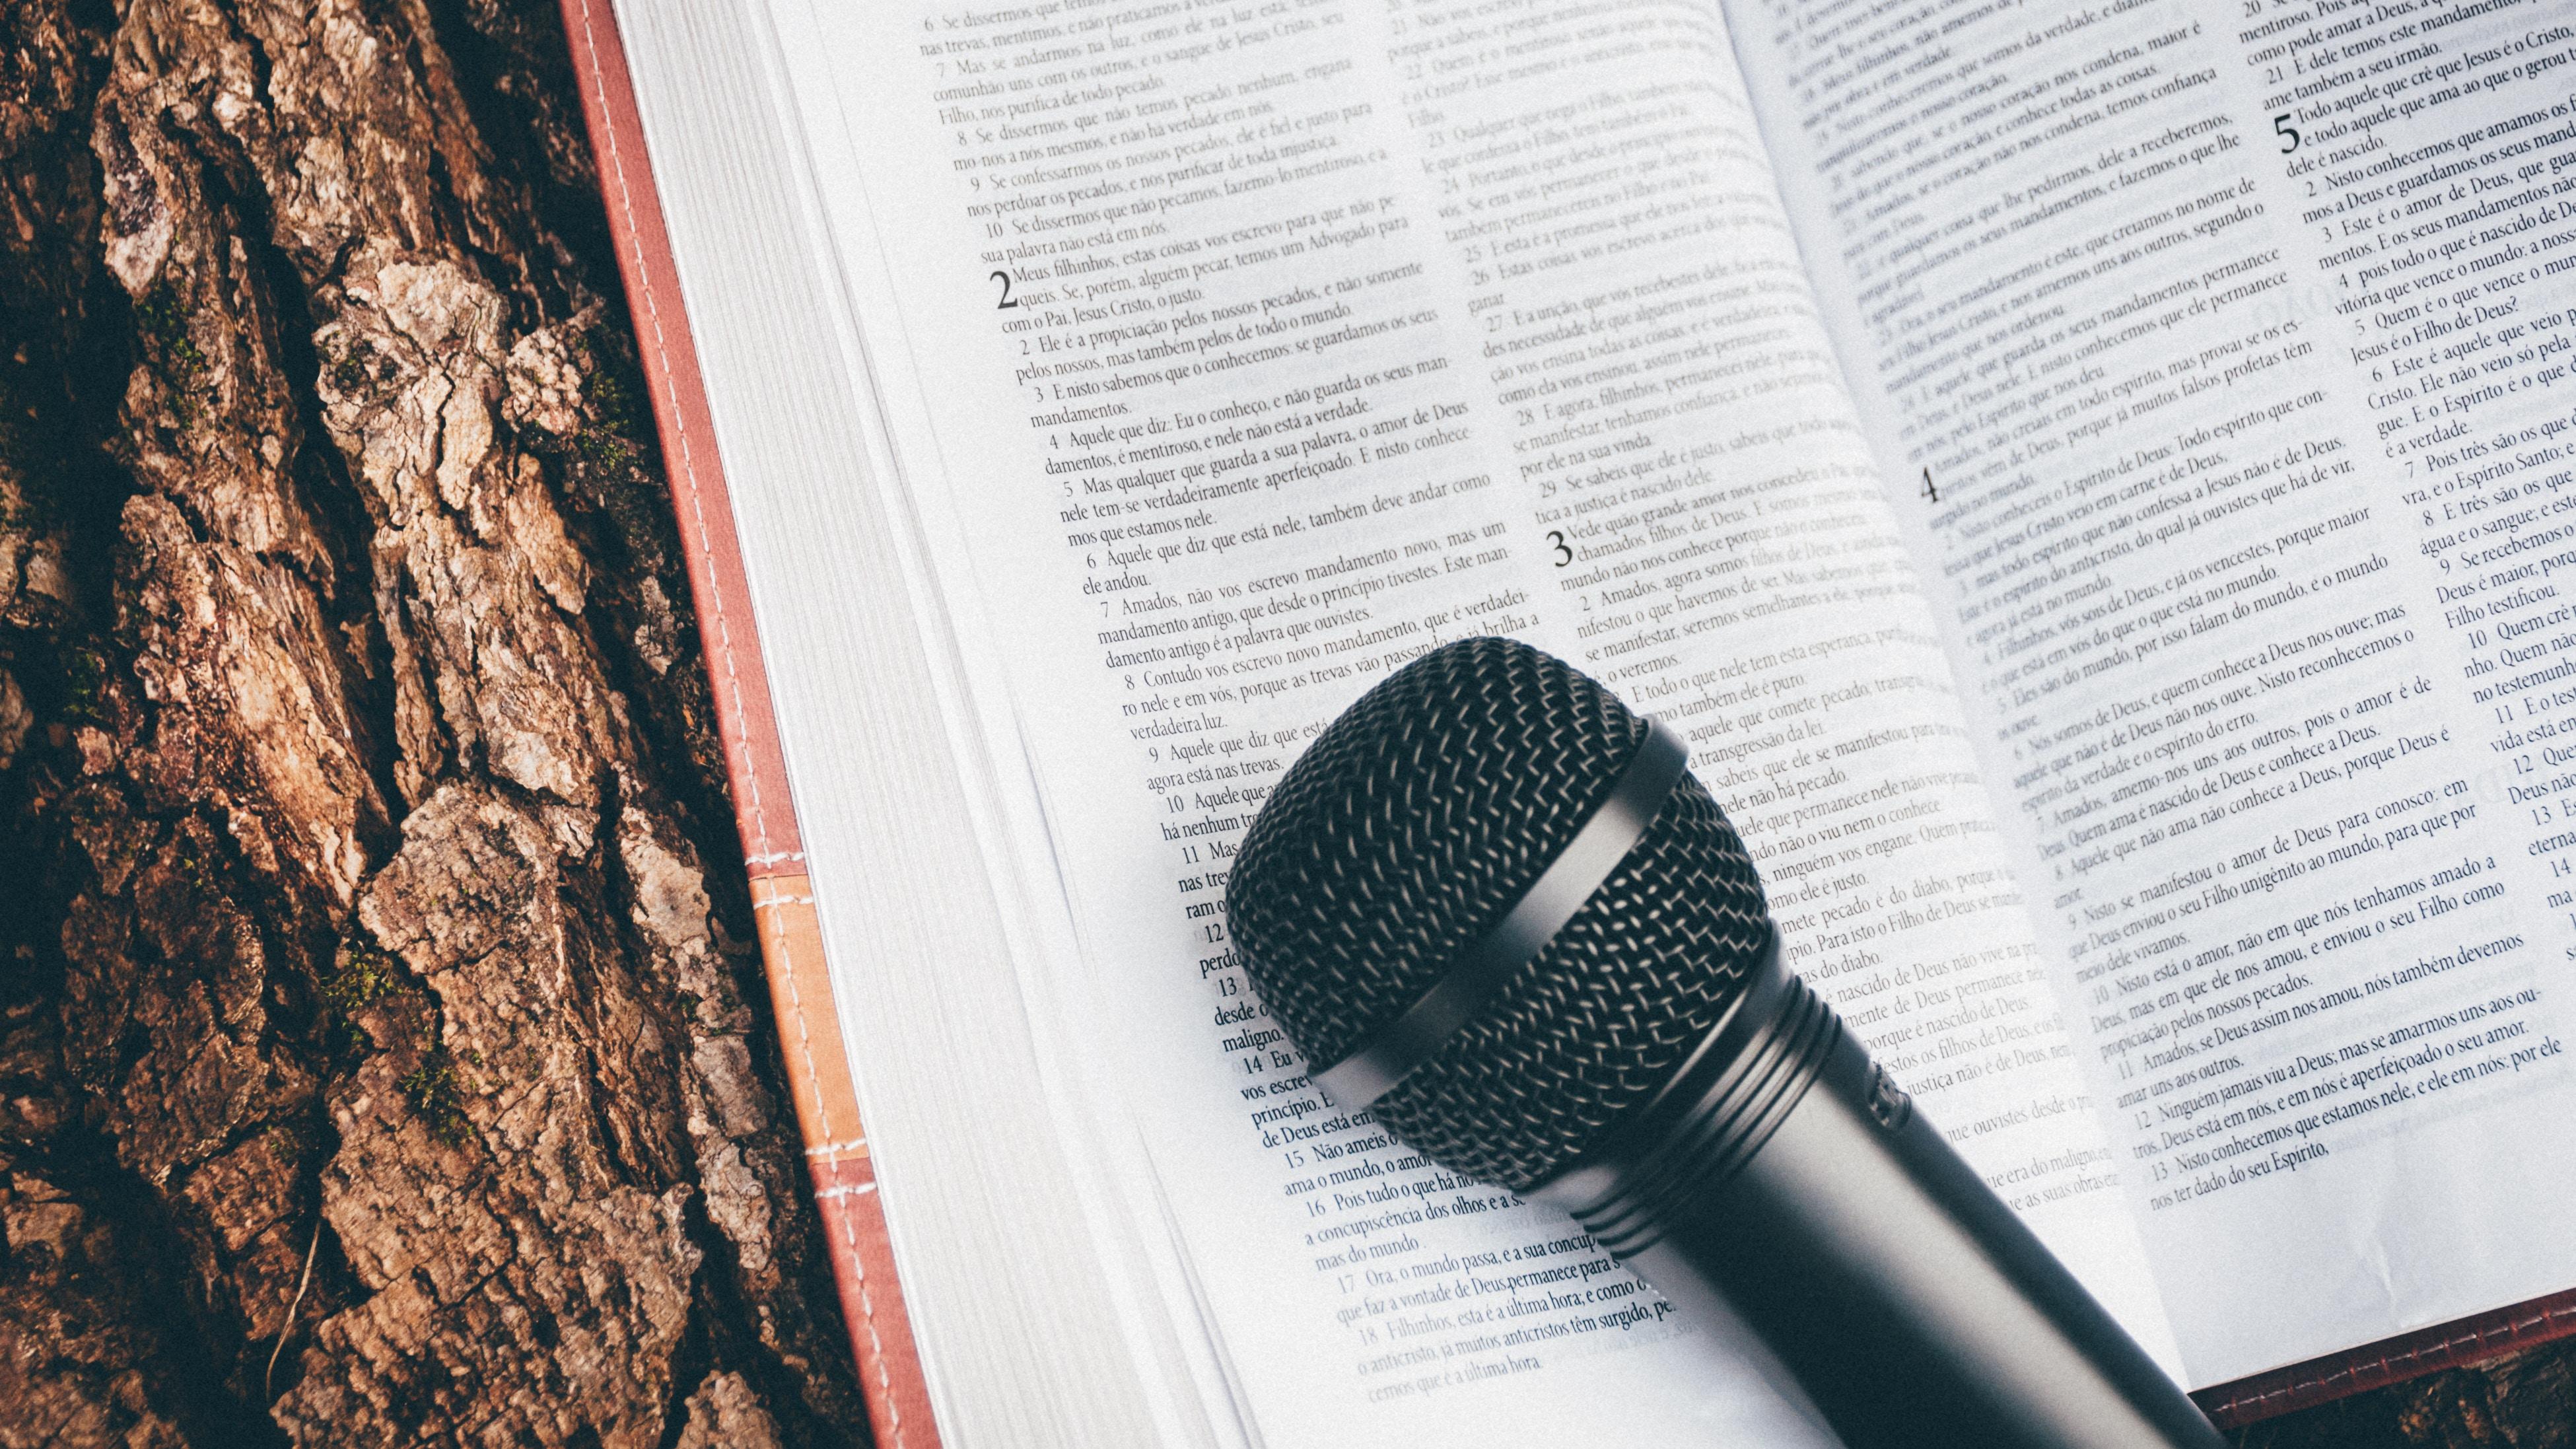 The Gospel That Transforms – 2 Corinthians 5:14-6:2